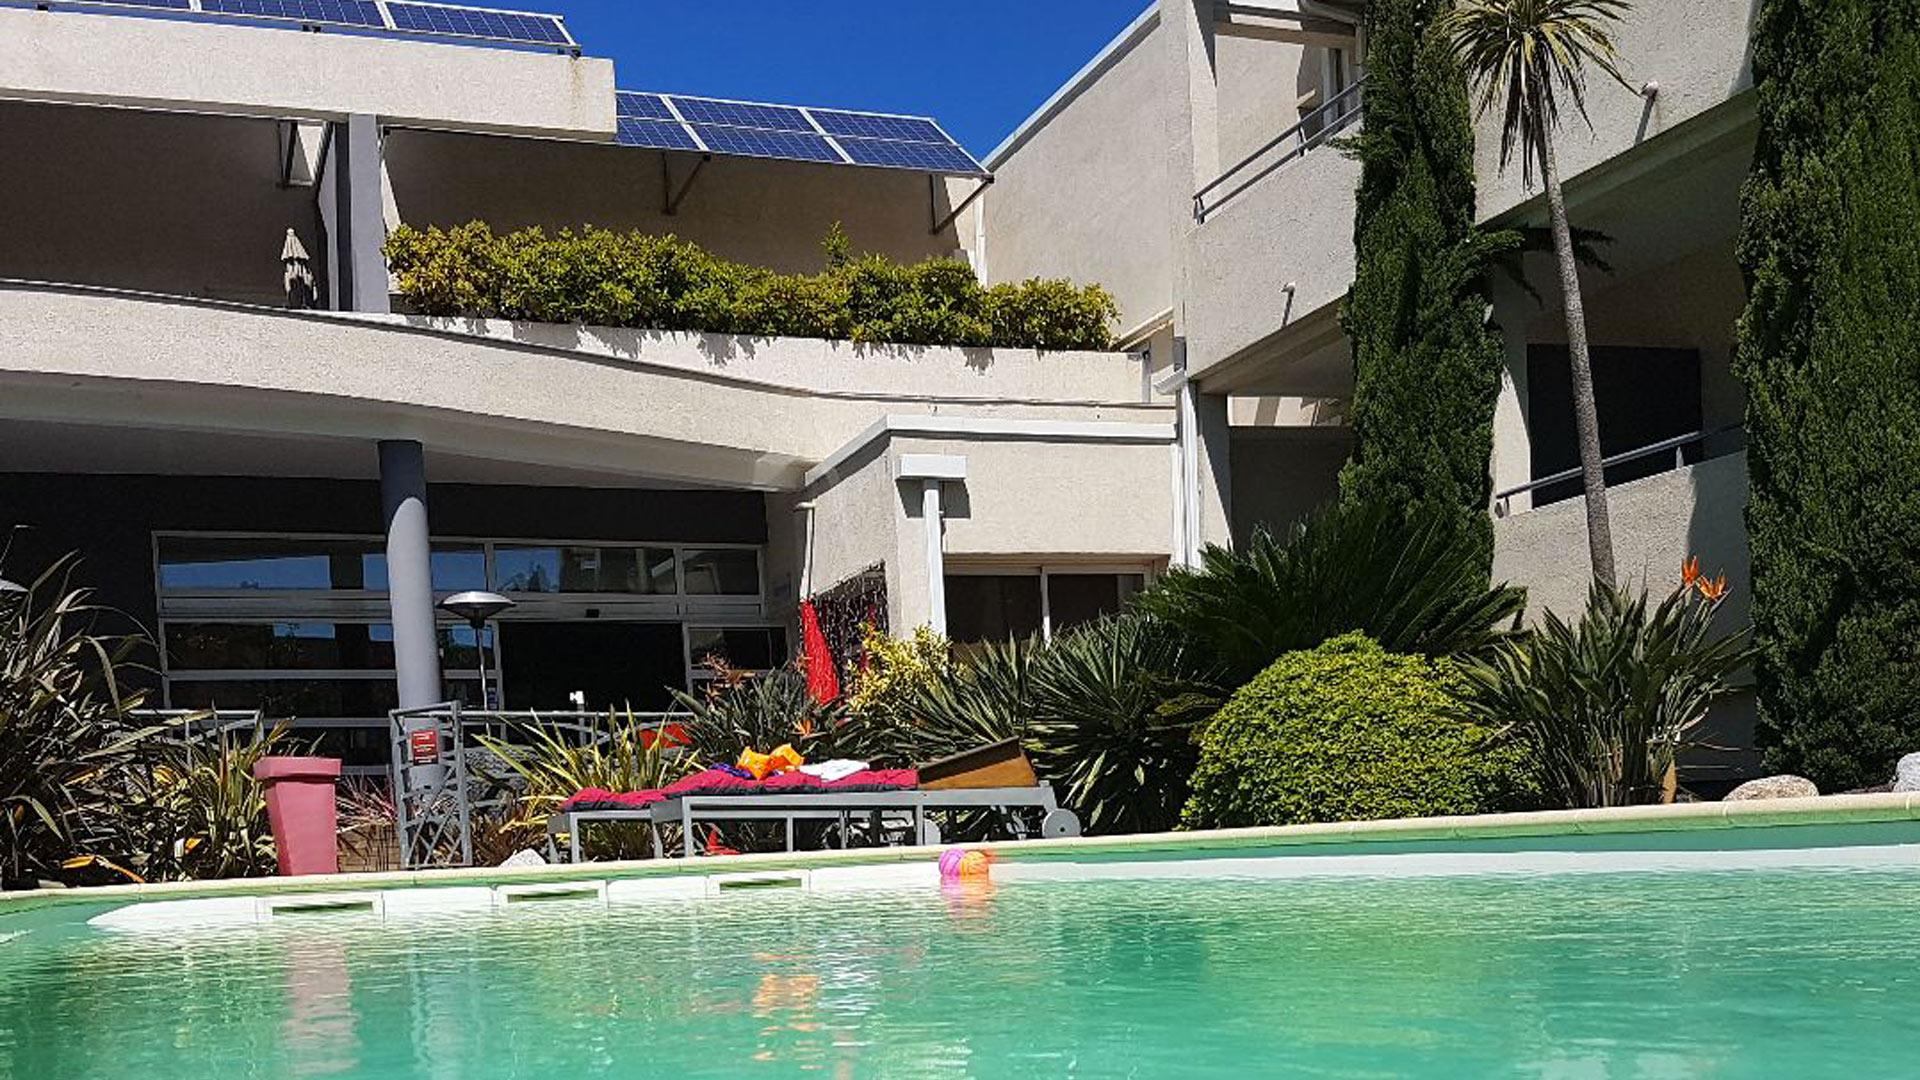 H tel perpignan la fauceille restaurant brasserie for Hotel perpignan avec piscine